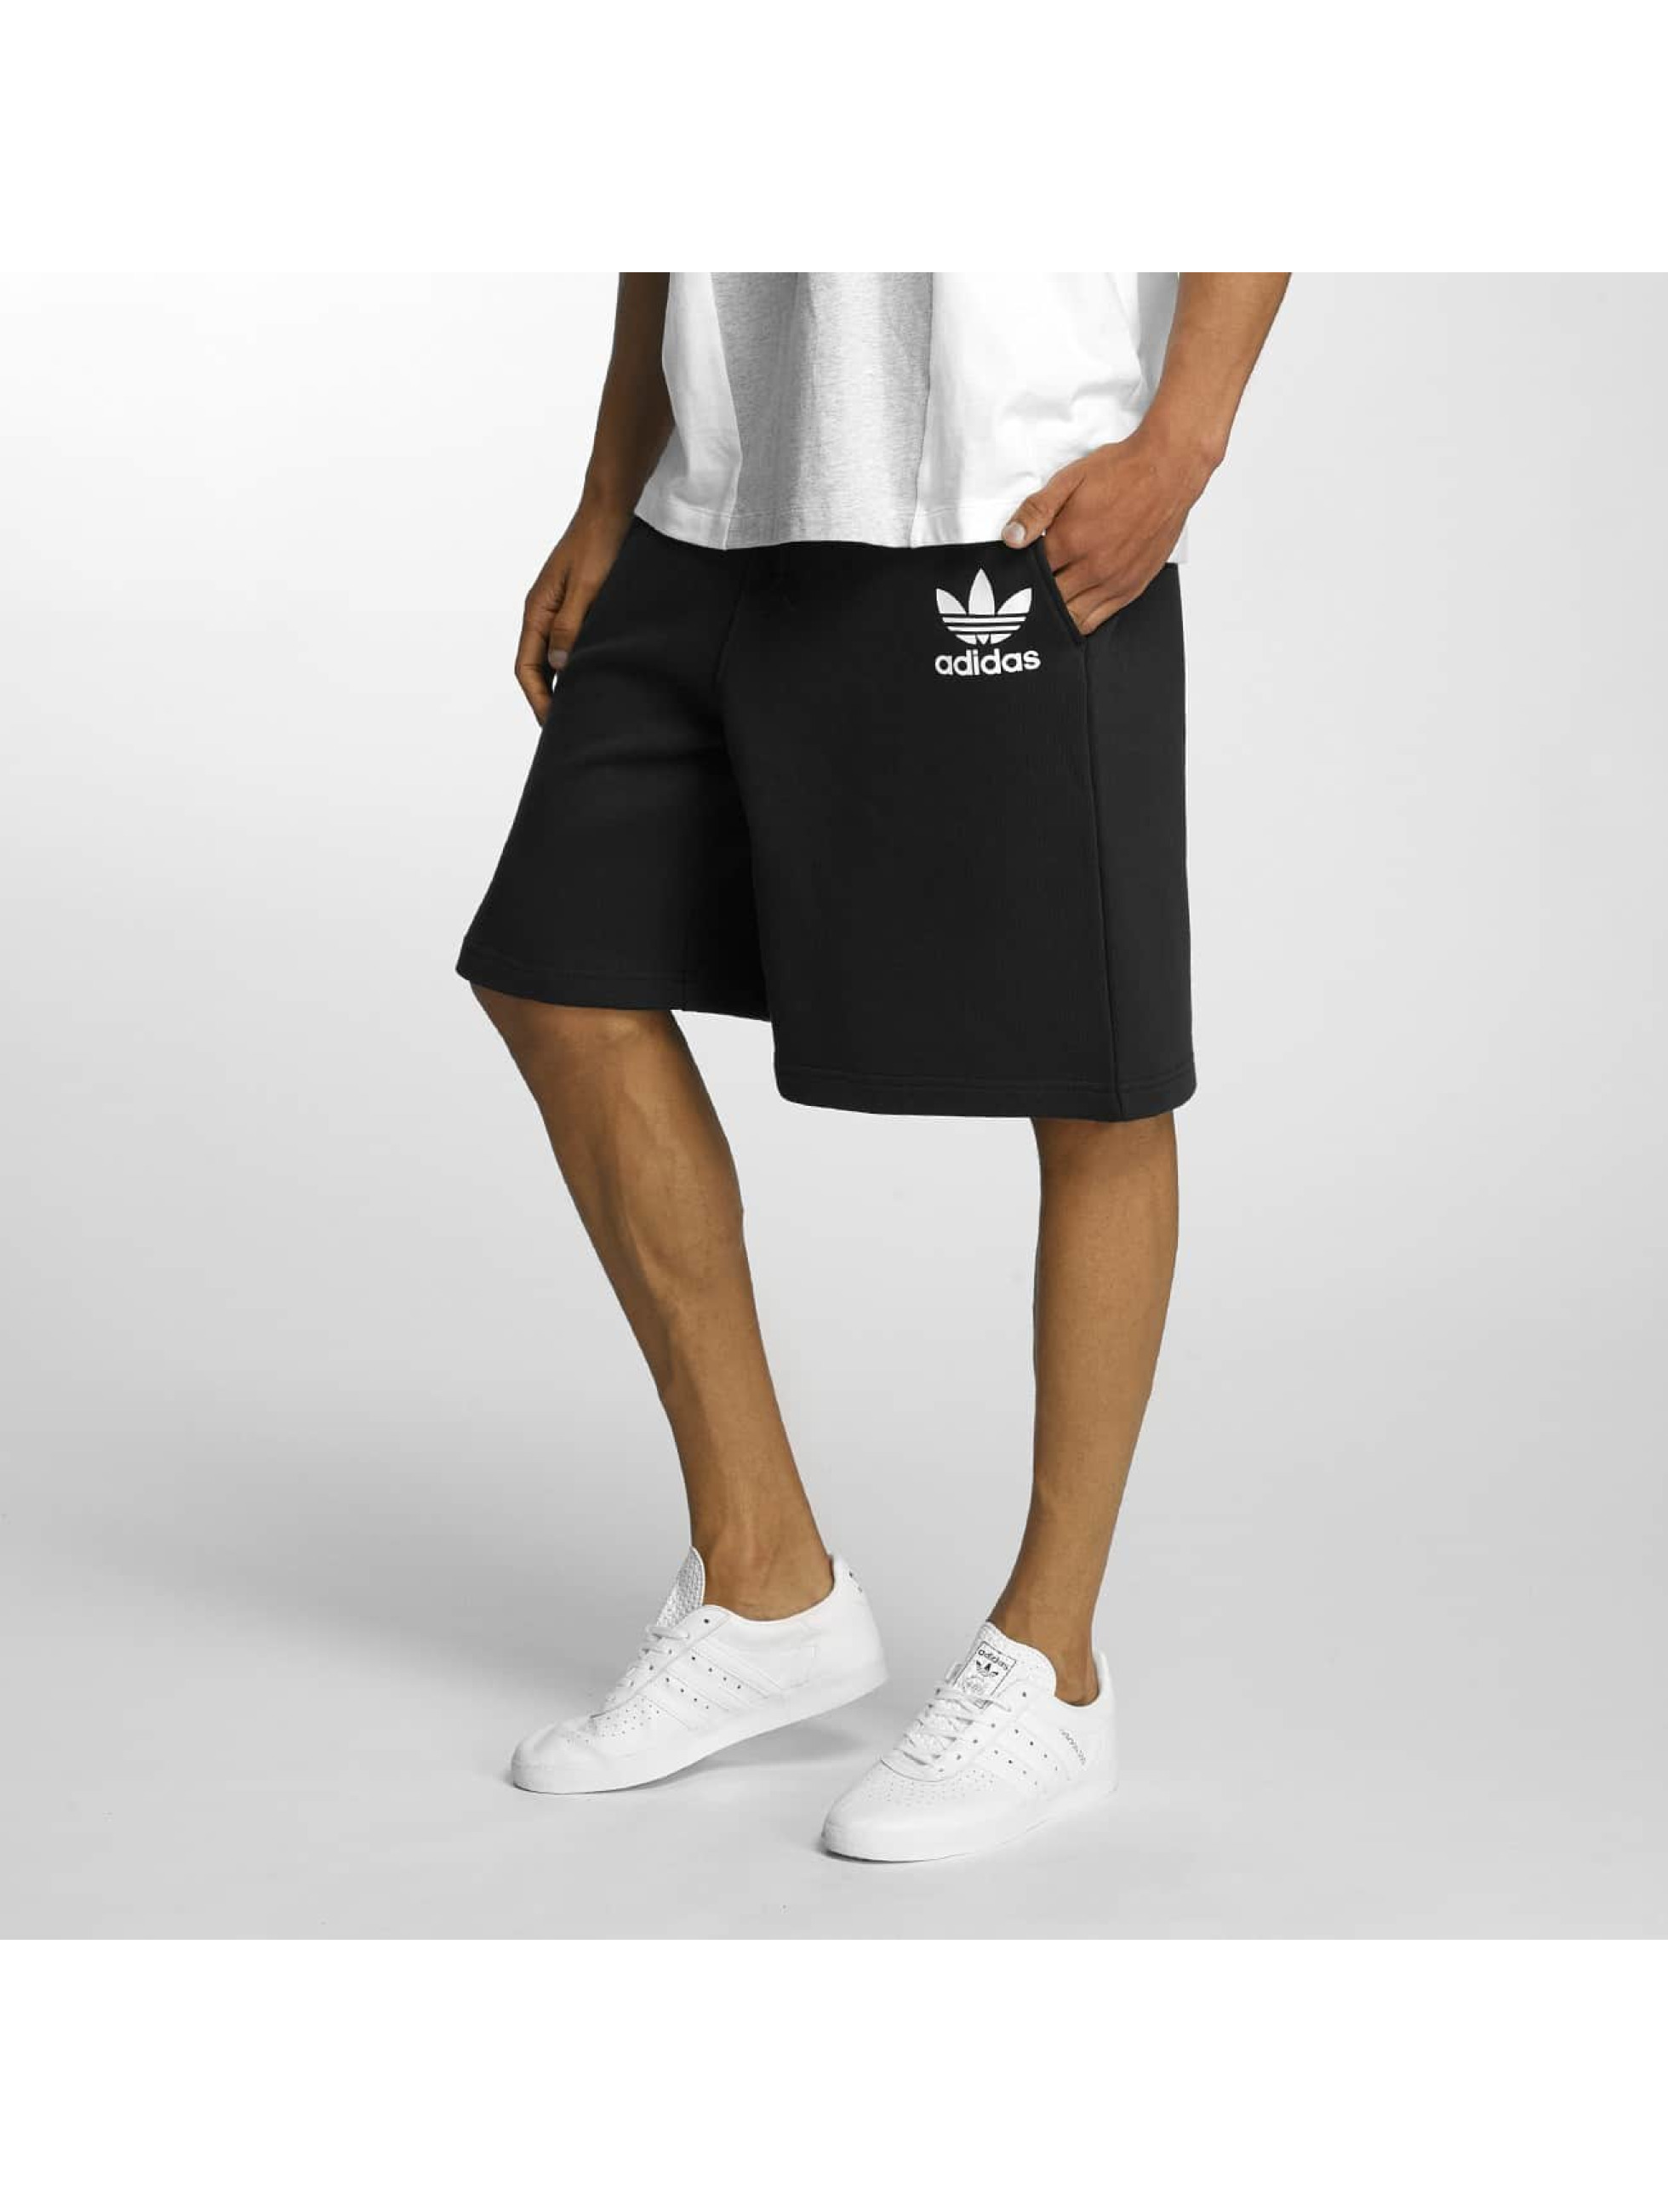 adidas Short ADC F black